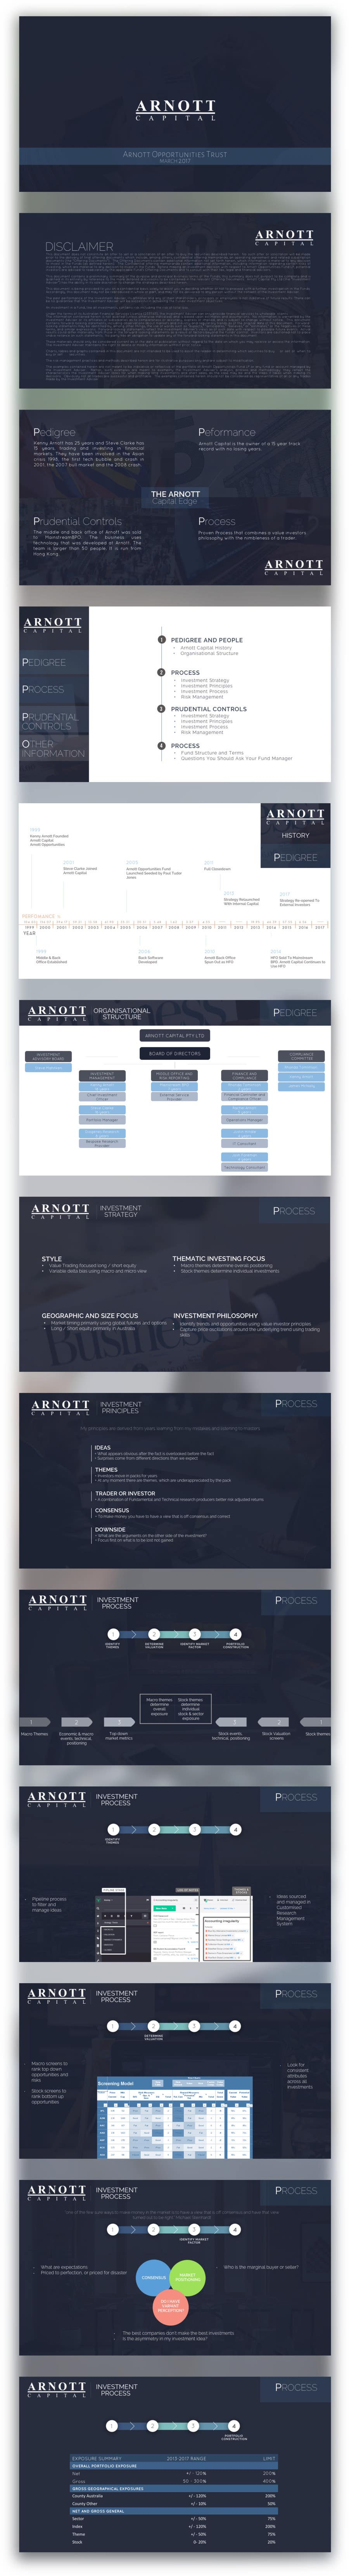 Proposition n°39 du concours Modernise a pitch book